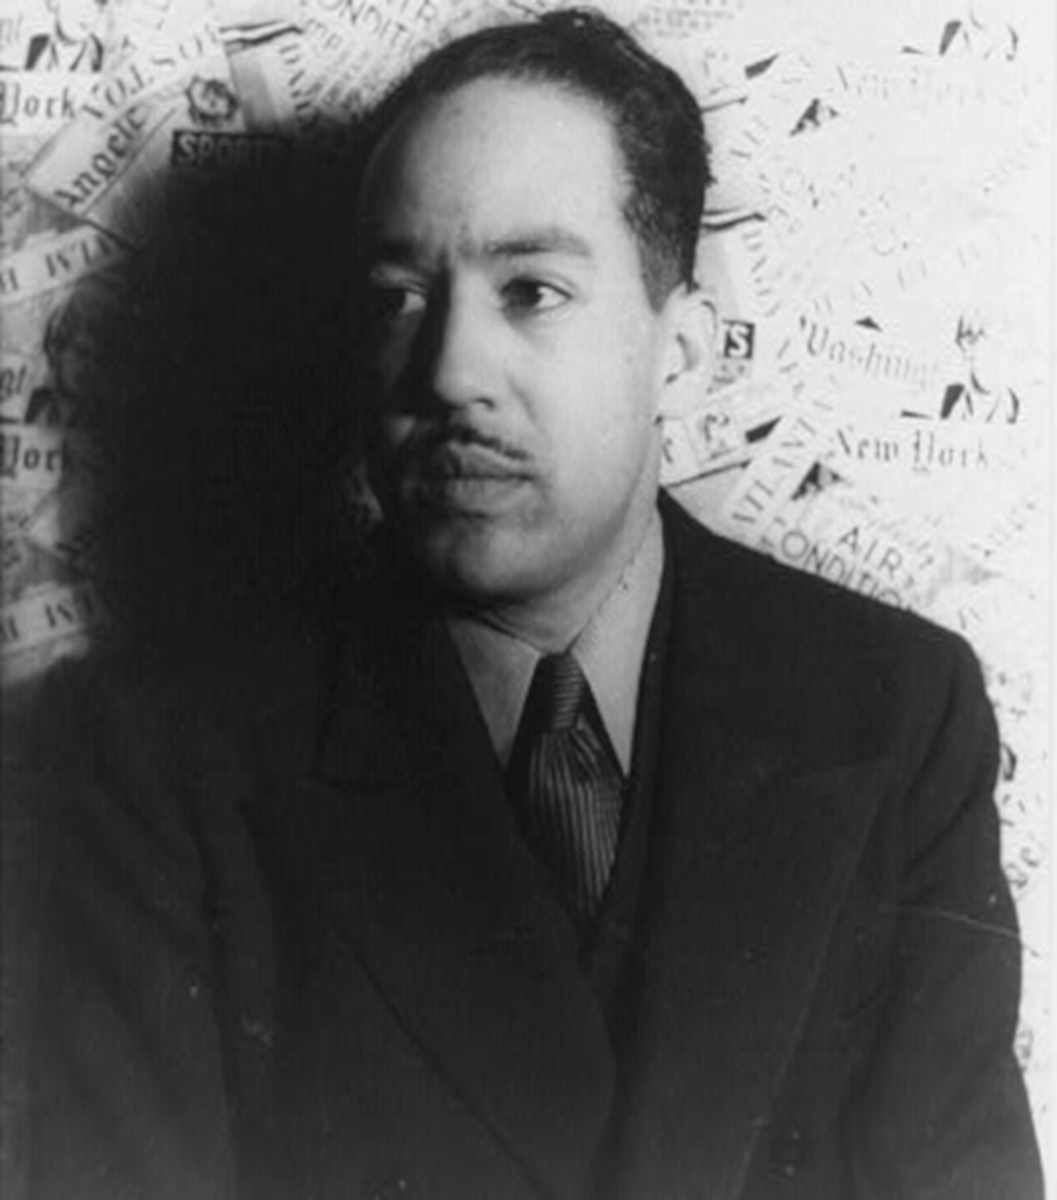 Portrait of poet, novelist, playwright Langston Hughes, 3/4 profile; Carl Van Vechten, photographer, Feb. 29, 1936.